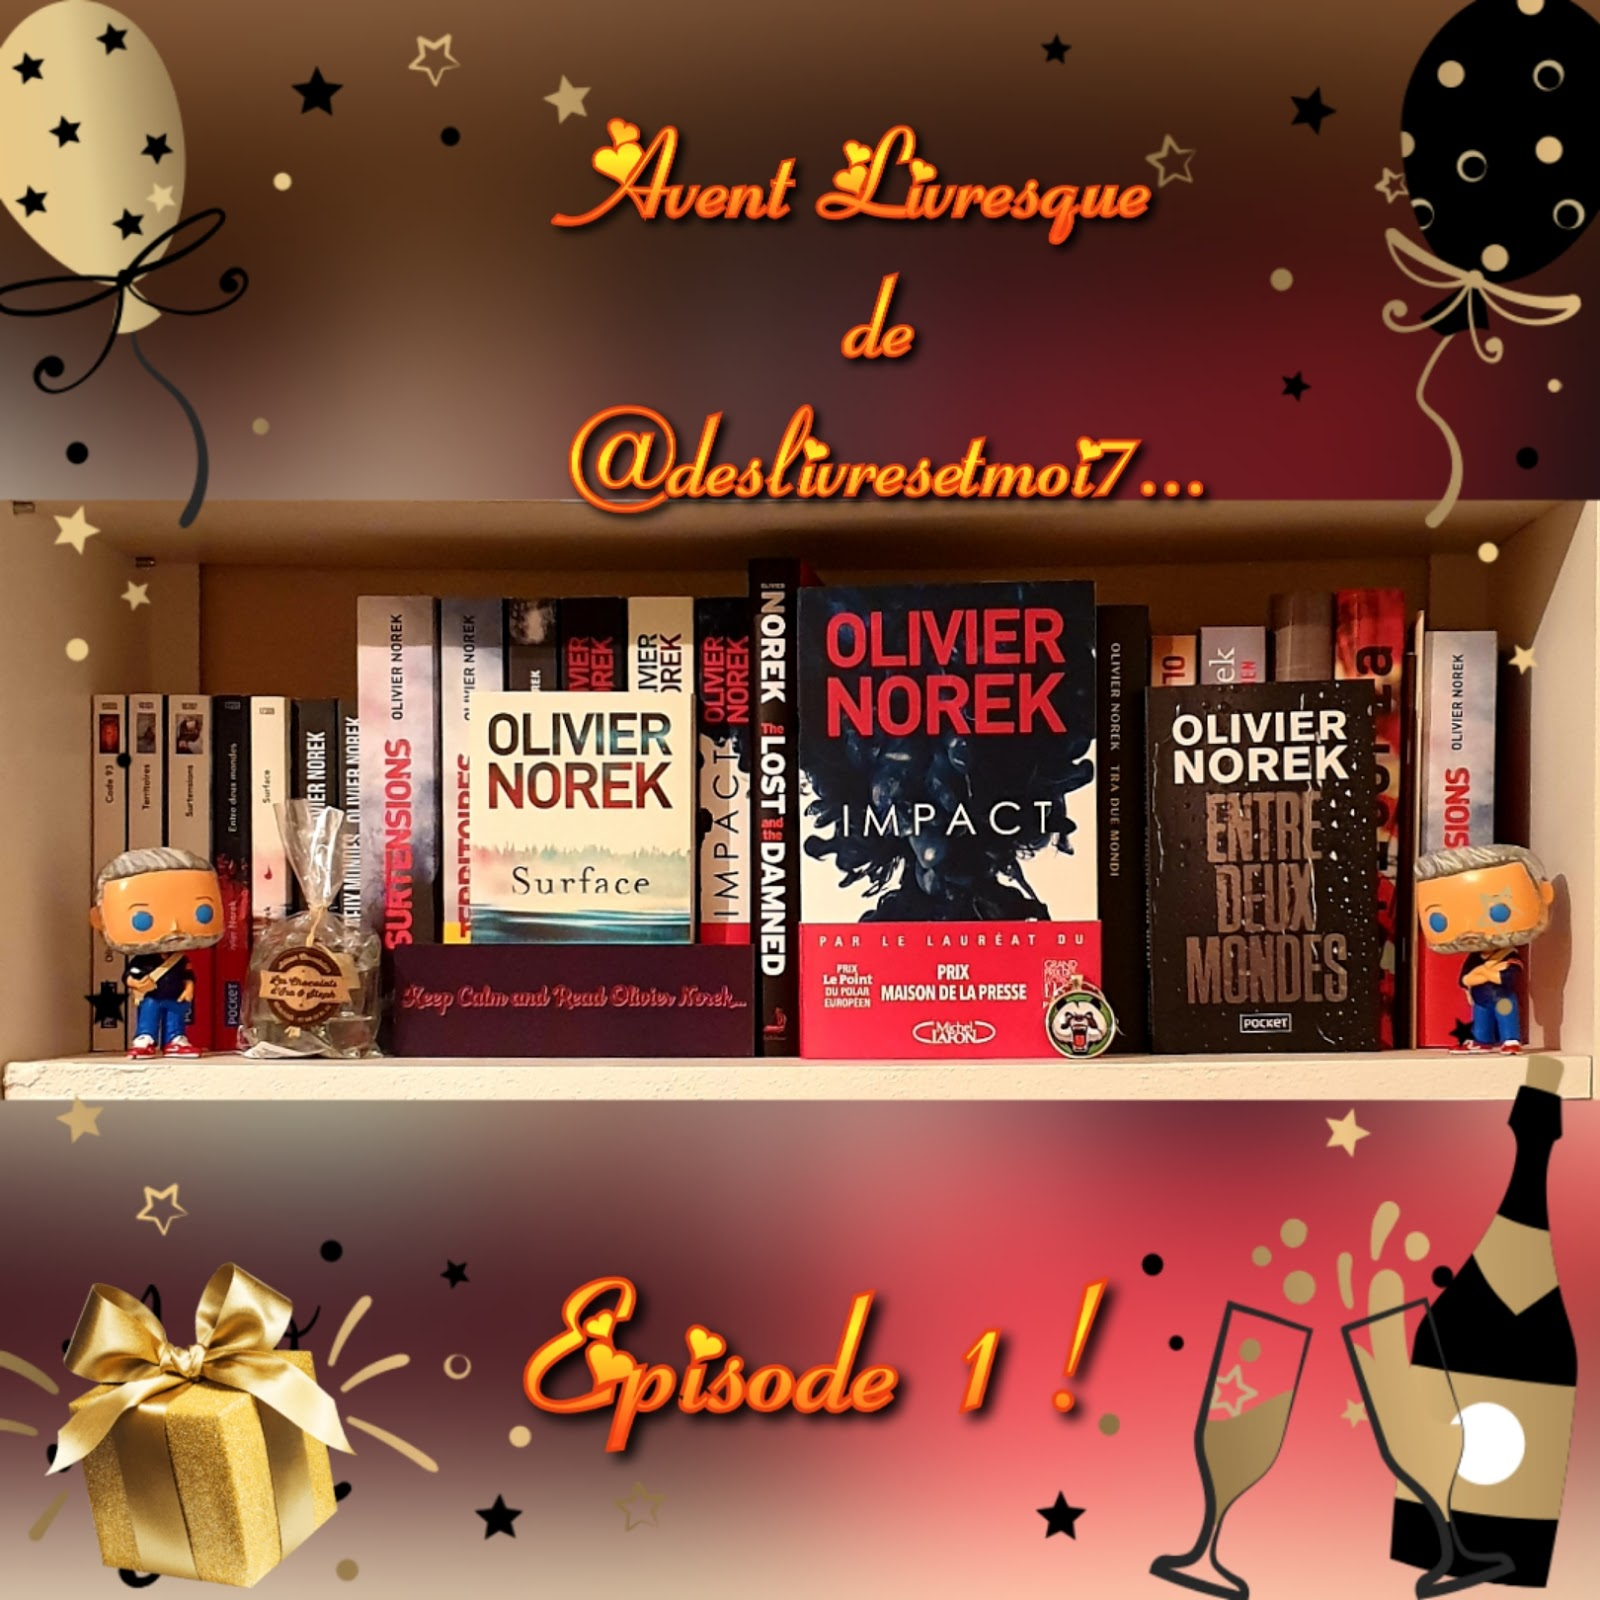 Avent Livresque… Episode 1 !